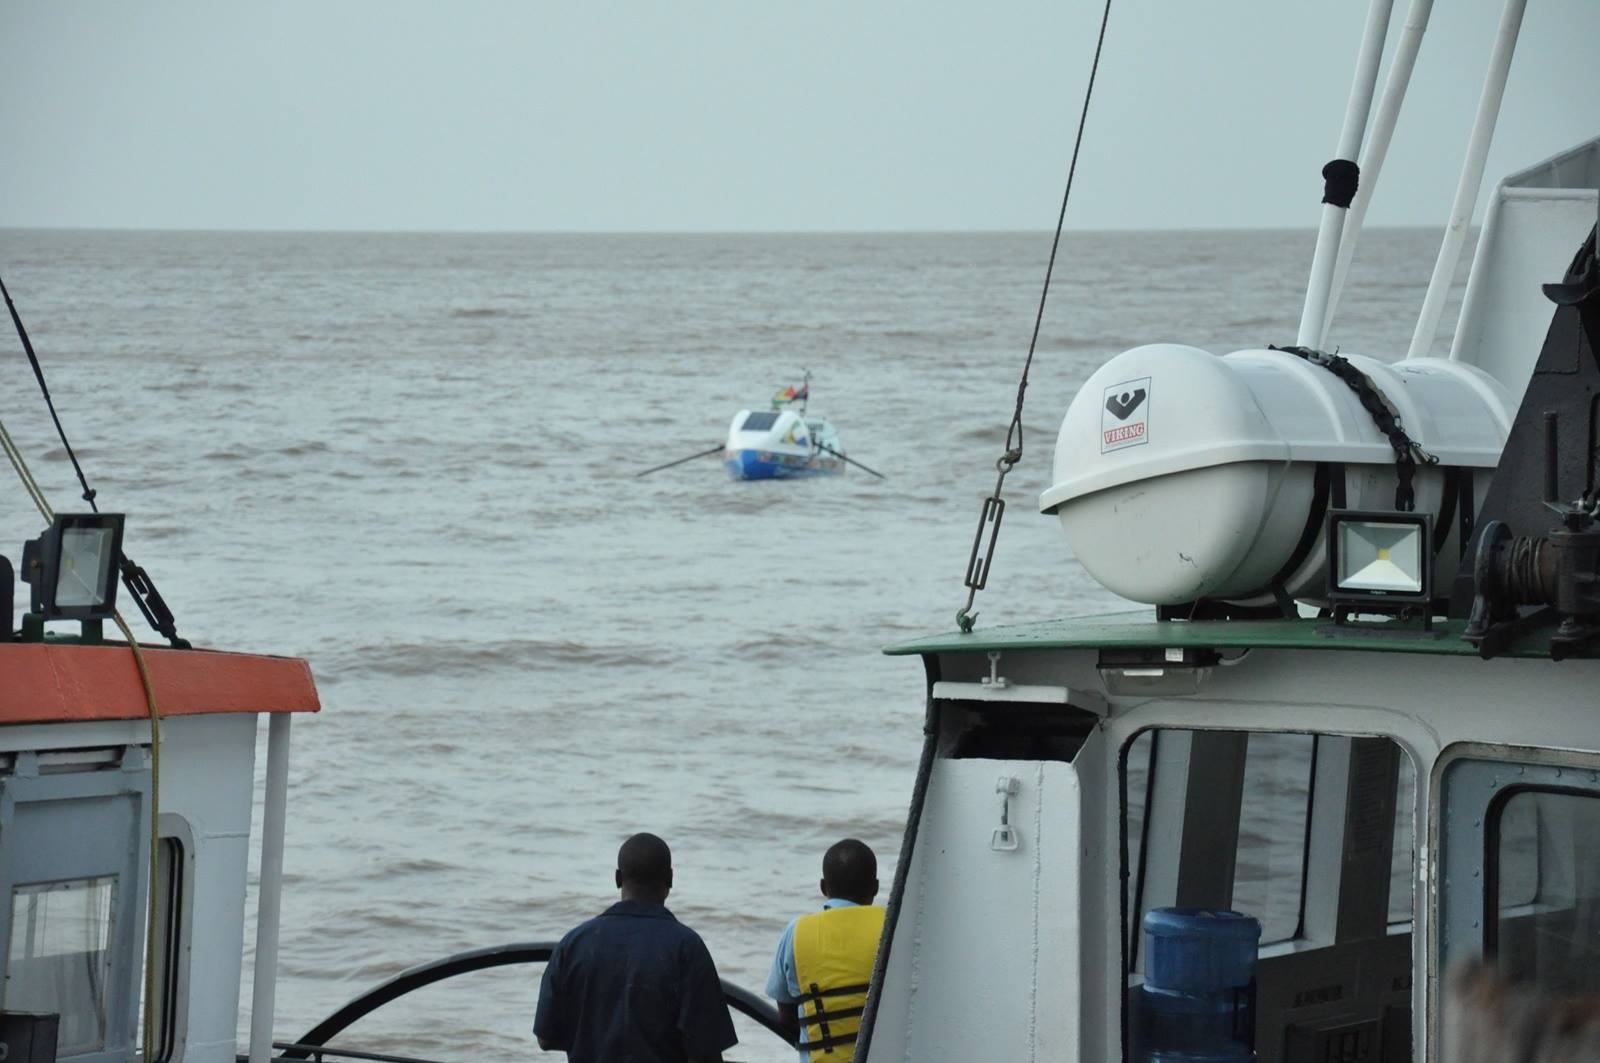 The boat, Tamu'kke, as it approaches land.